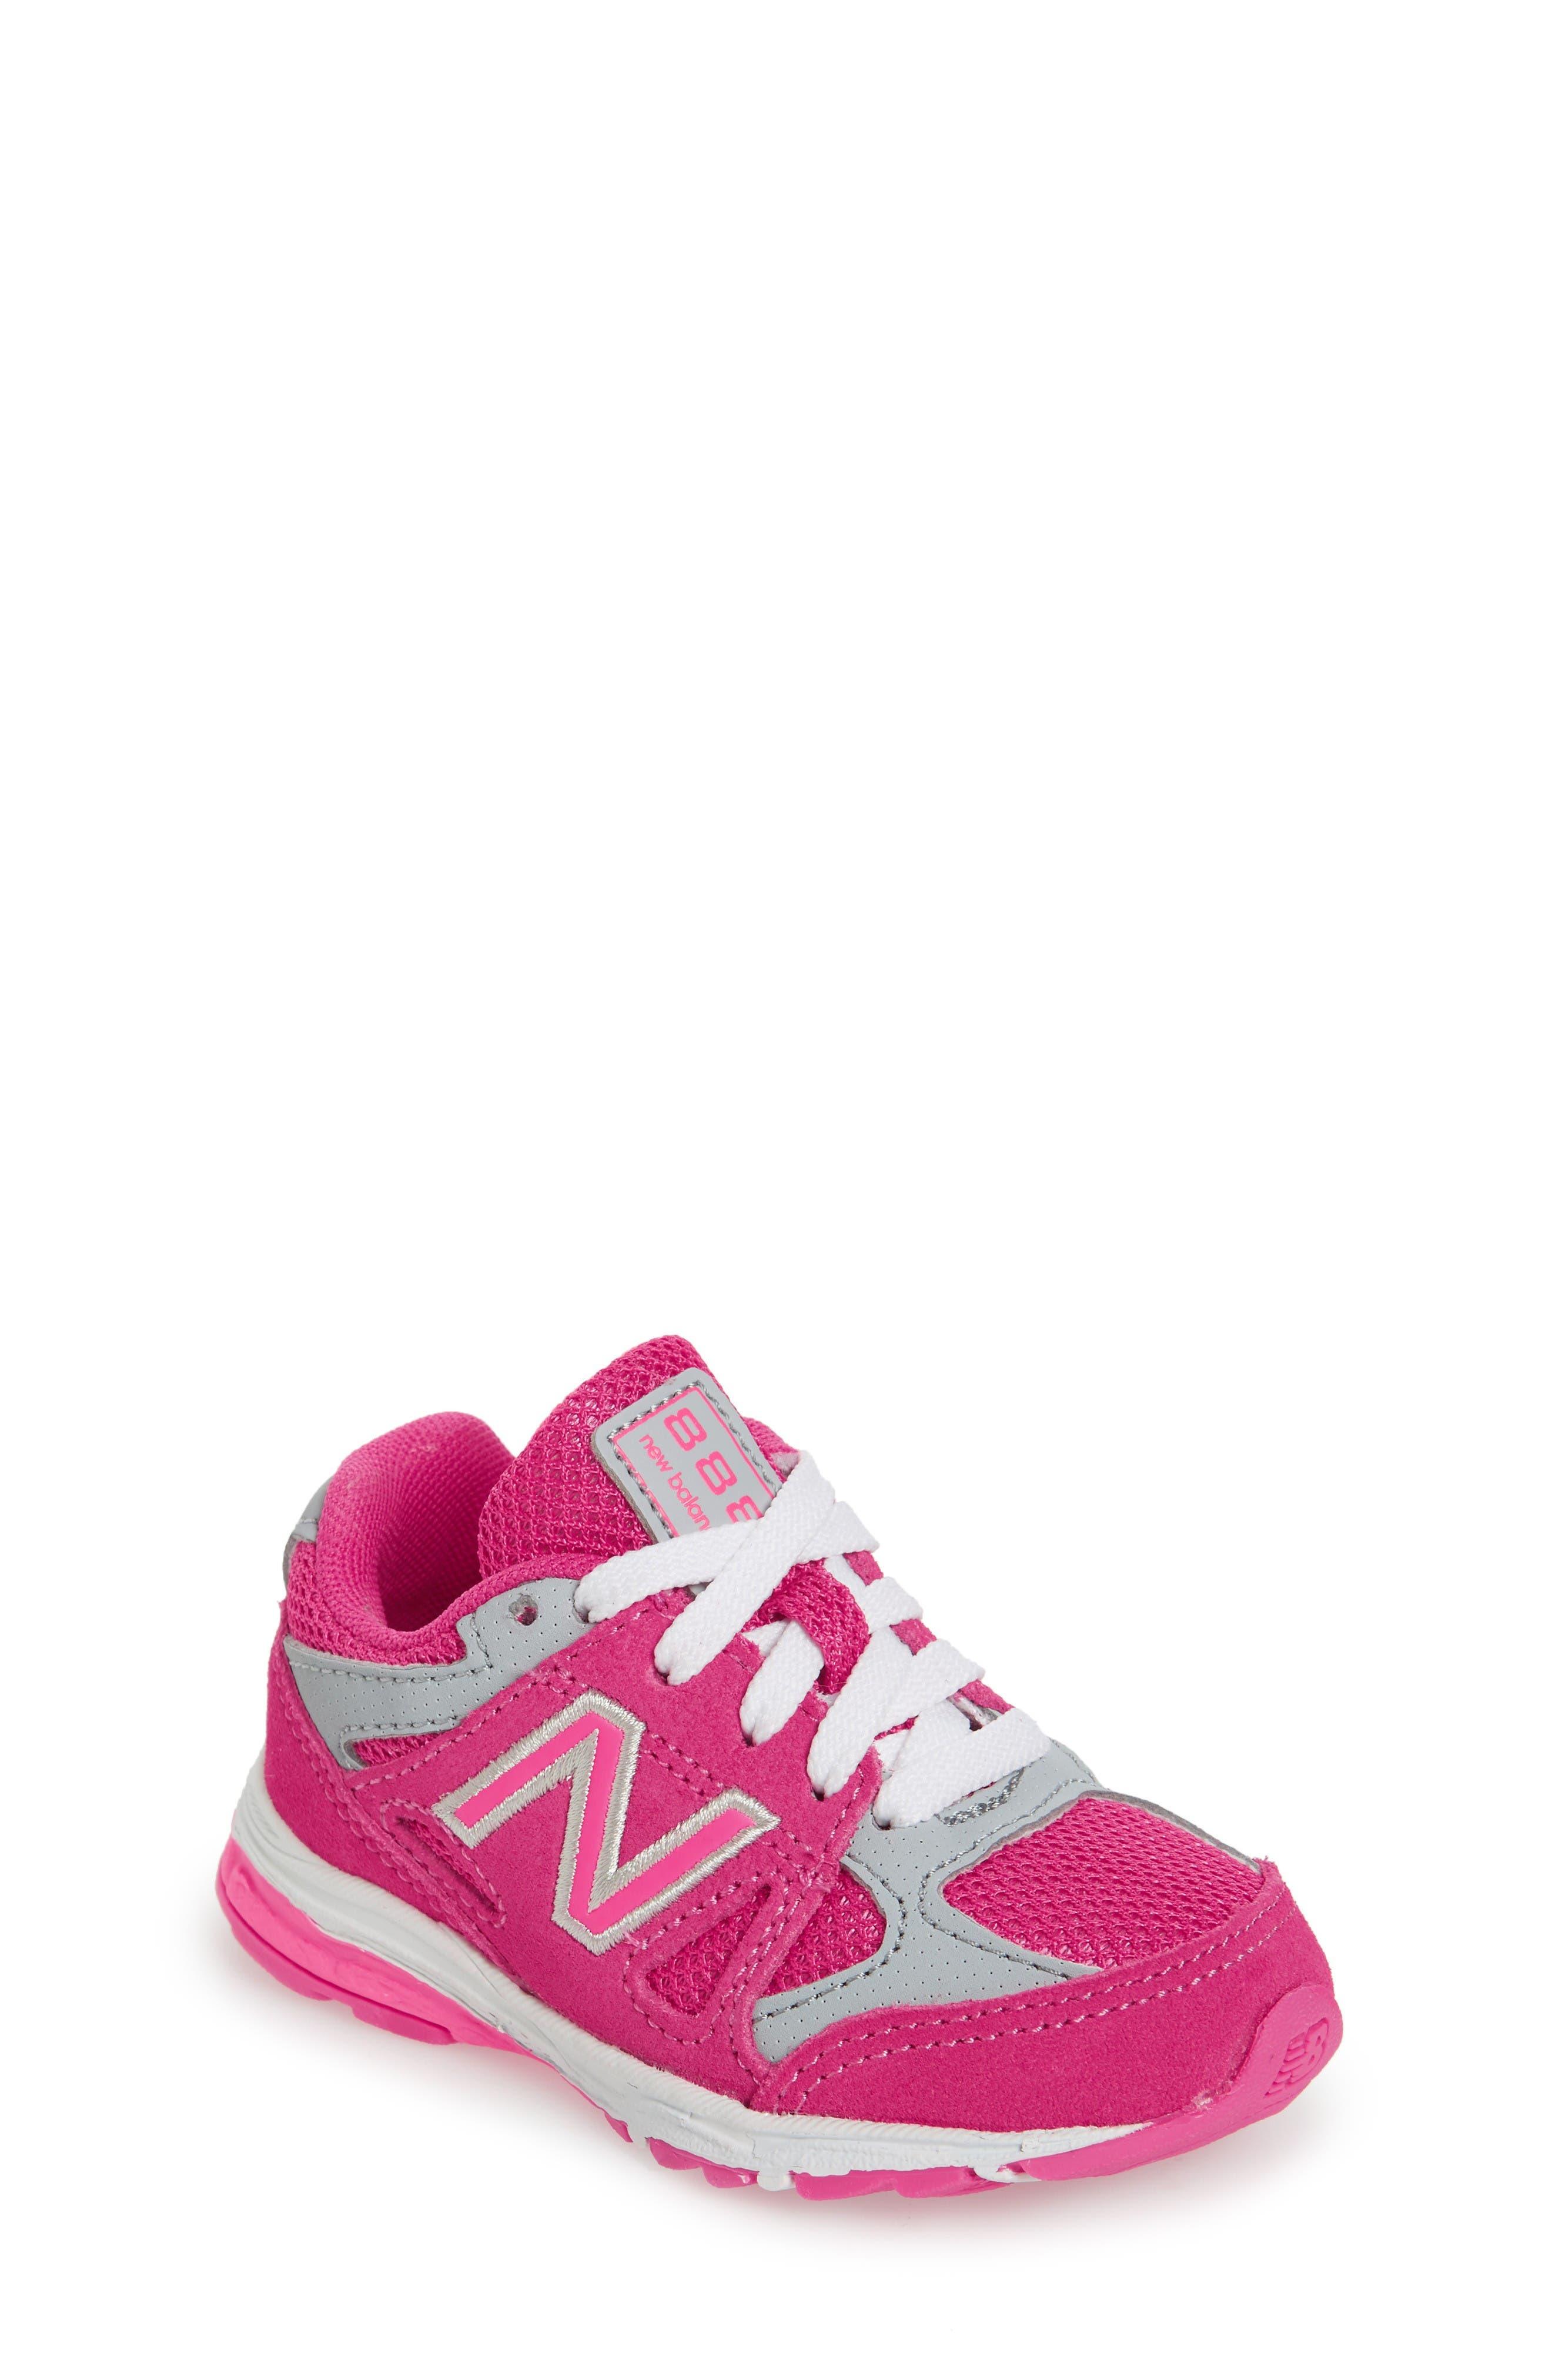 Main Image - New Balance 888 Sneaker (Baby, Walker, Toddler, Little Kid & Big Kid)